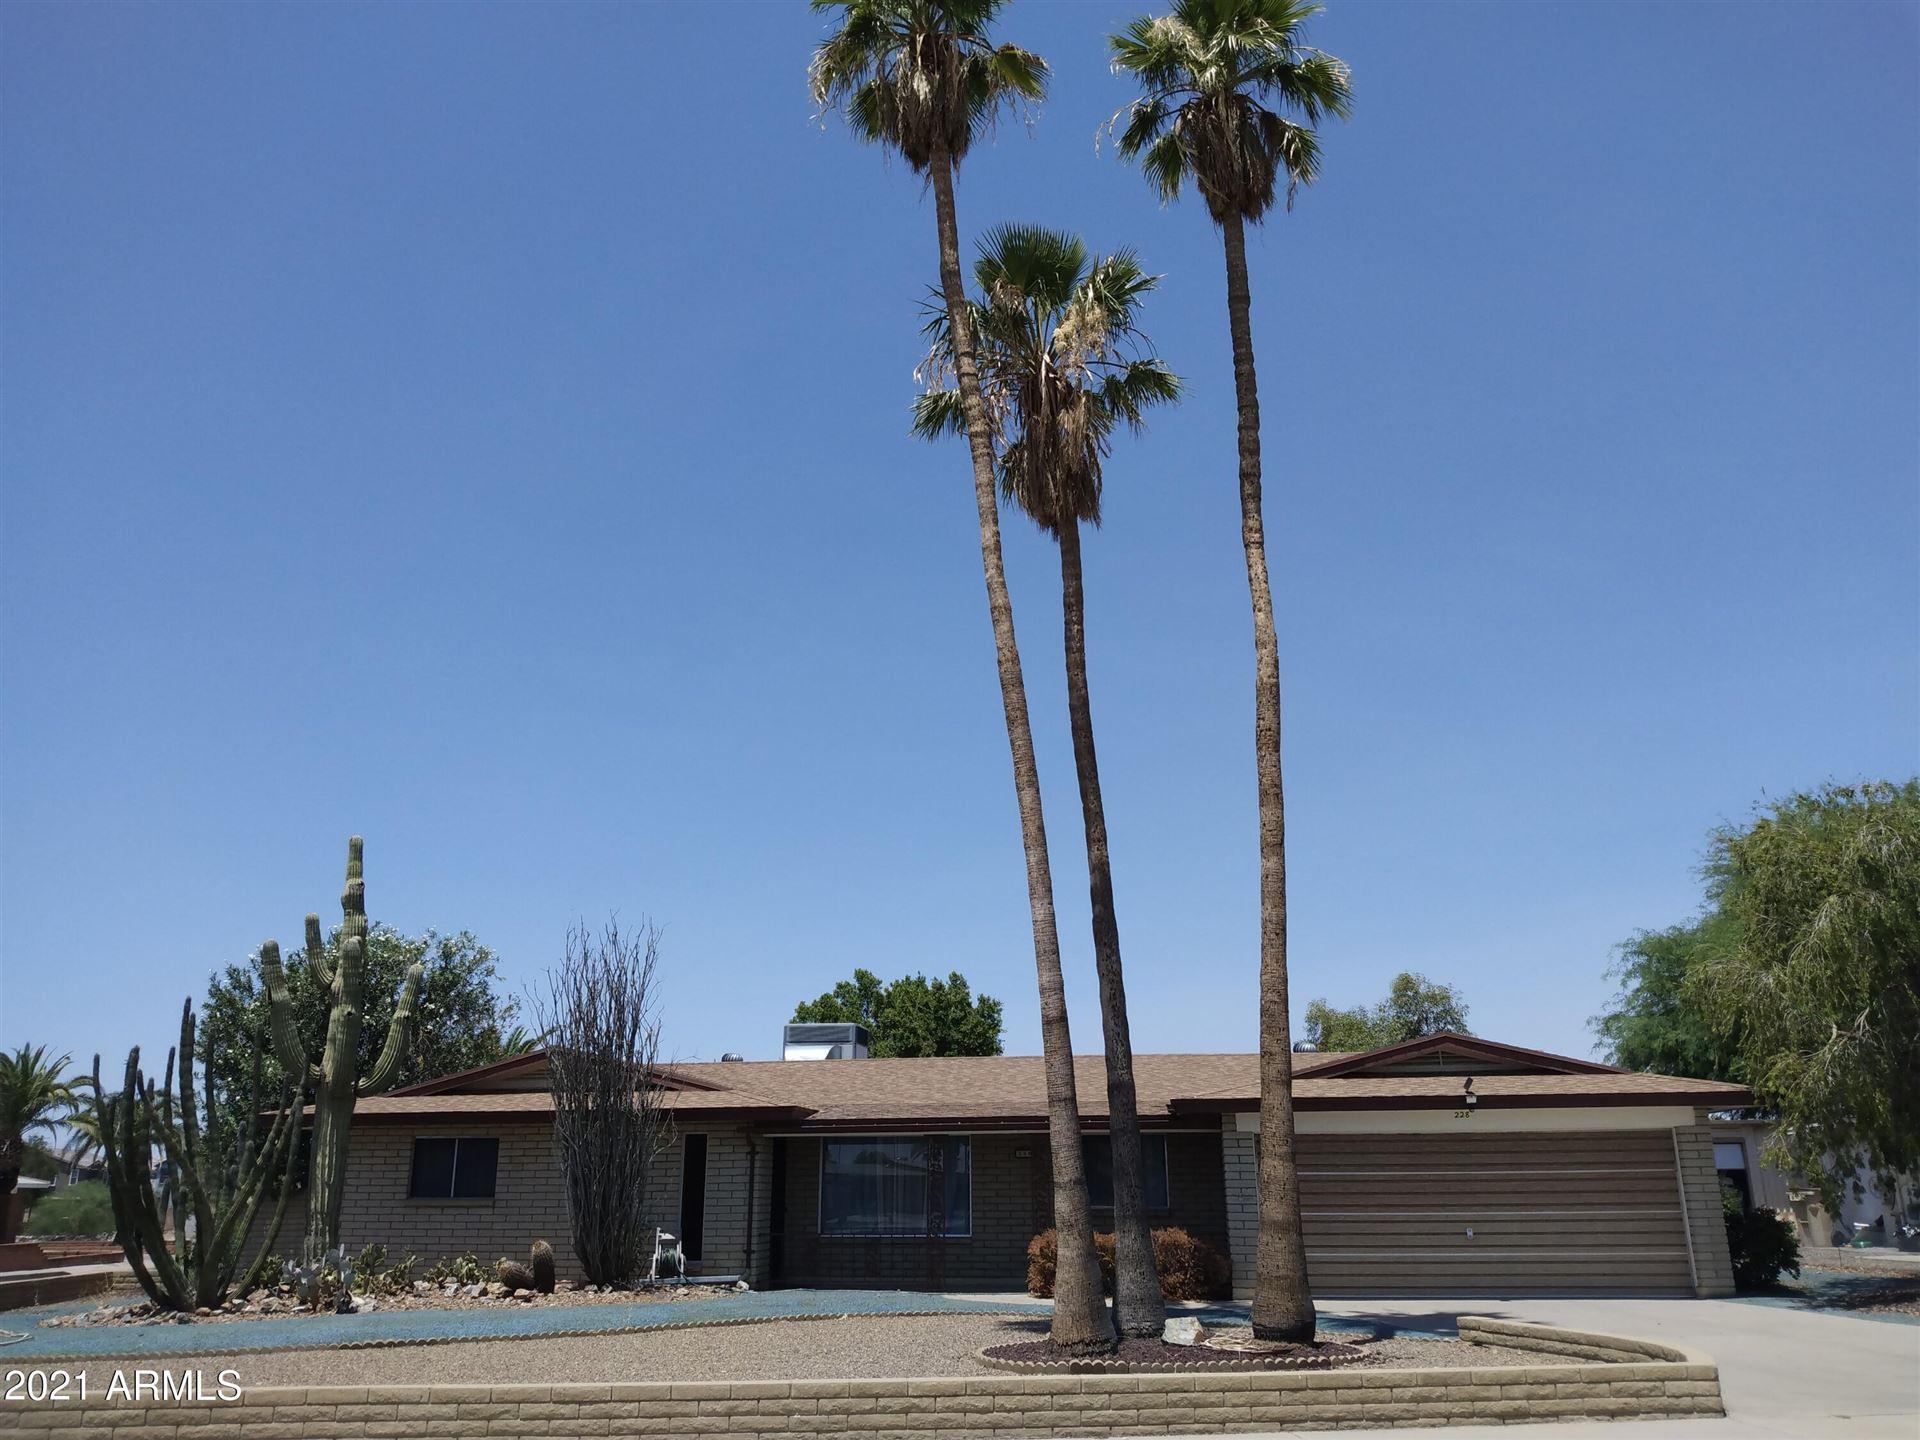 228 N 58TH Place, Mesa, AZ 85205 - MLS#: 6259774